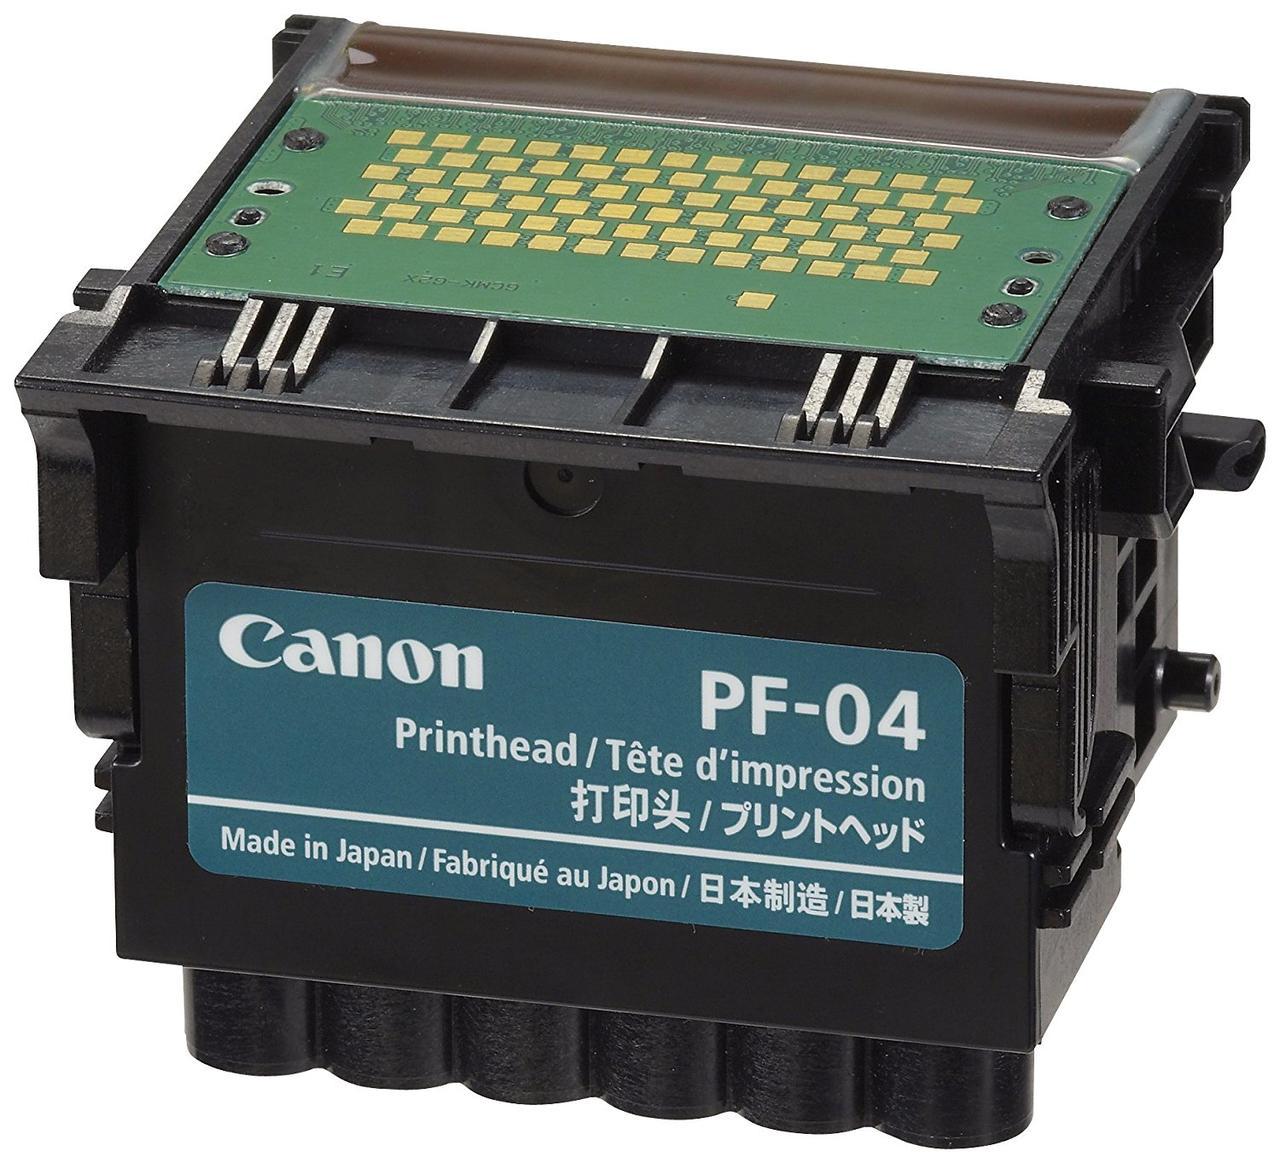 Печатающая головка Canon PF-04 для плоттеров Canon iPF670/iPF750/iPF770/iPF830